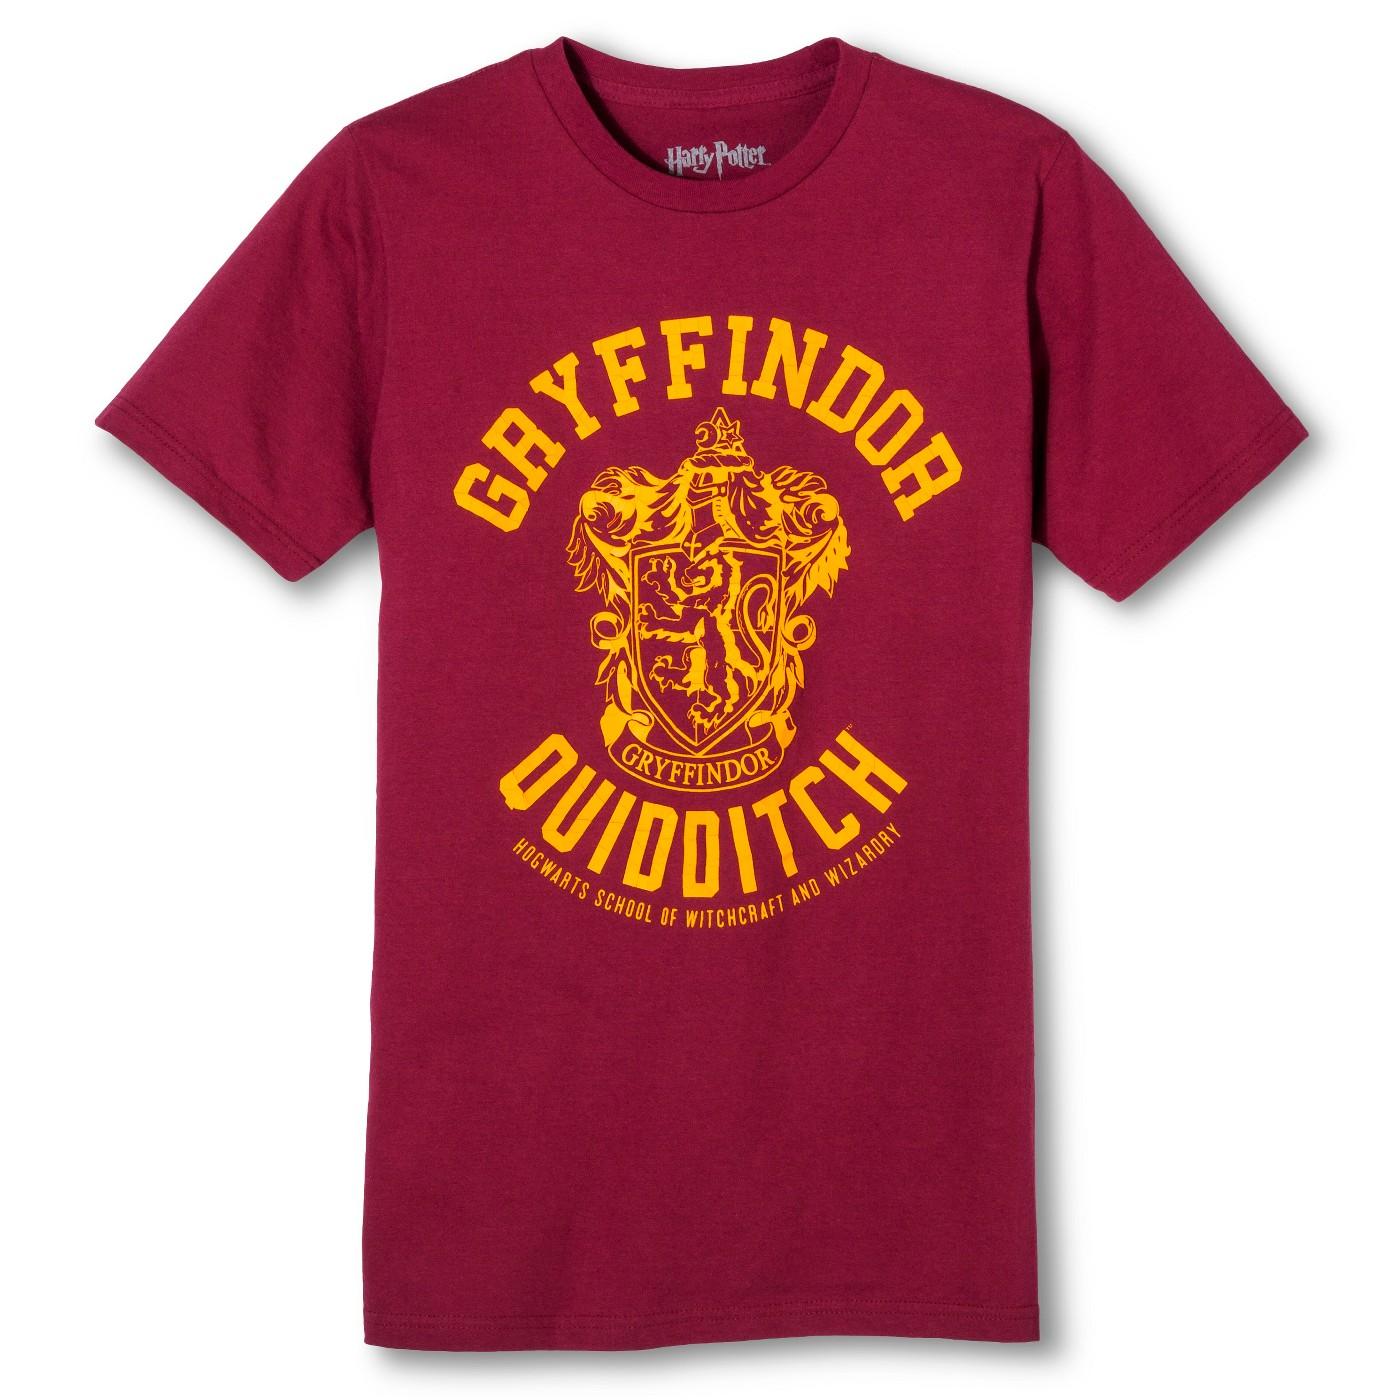 Men's Harry Potter® Gryffindor Quidditch Team T-Shirt - Burgundy - image 1 of 1